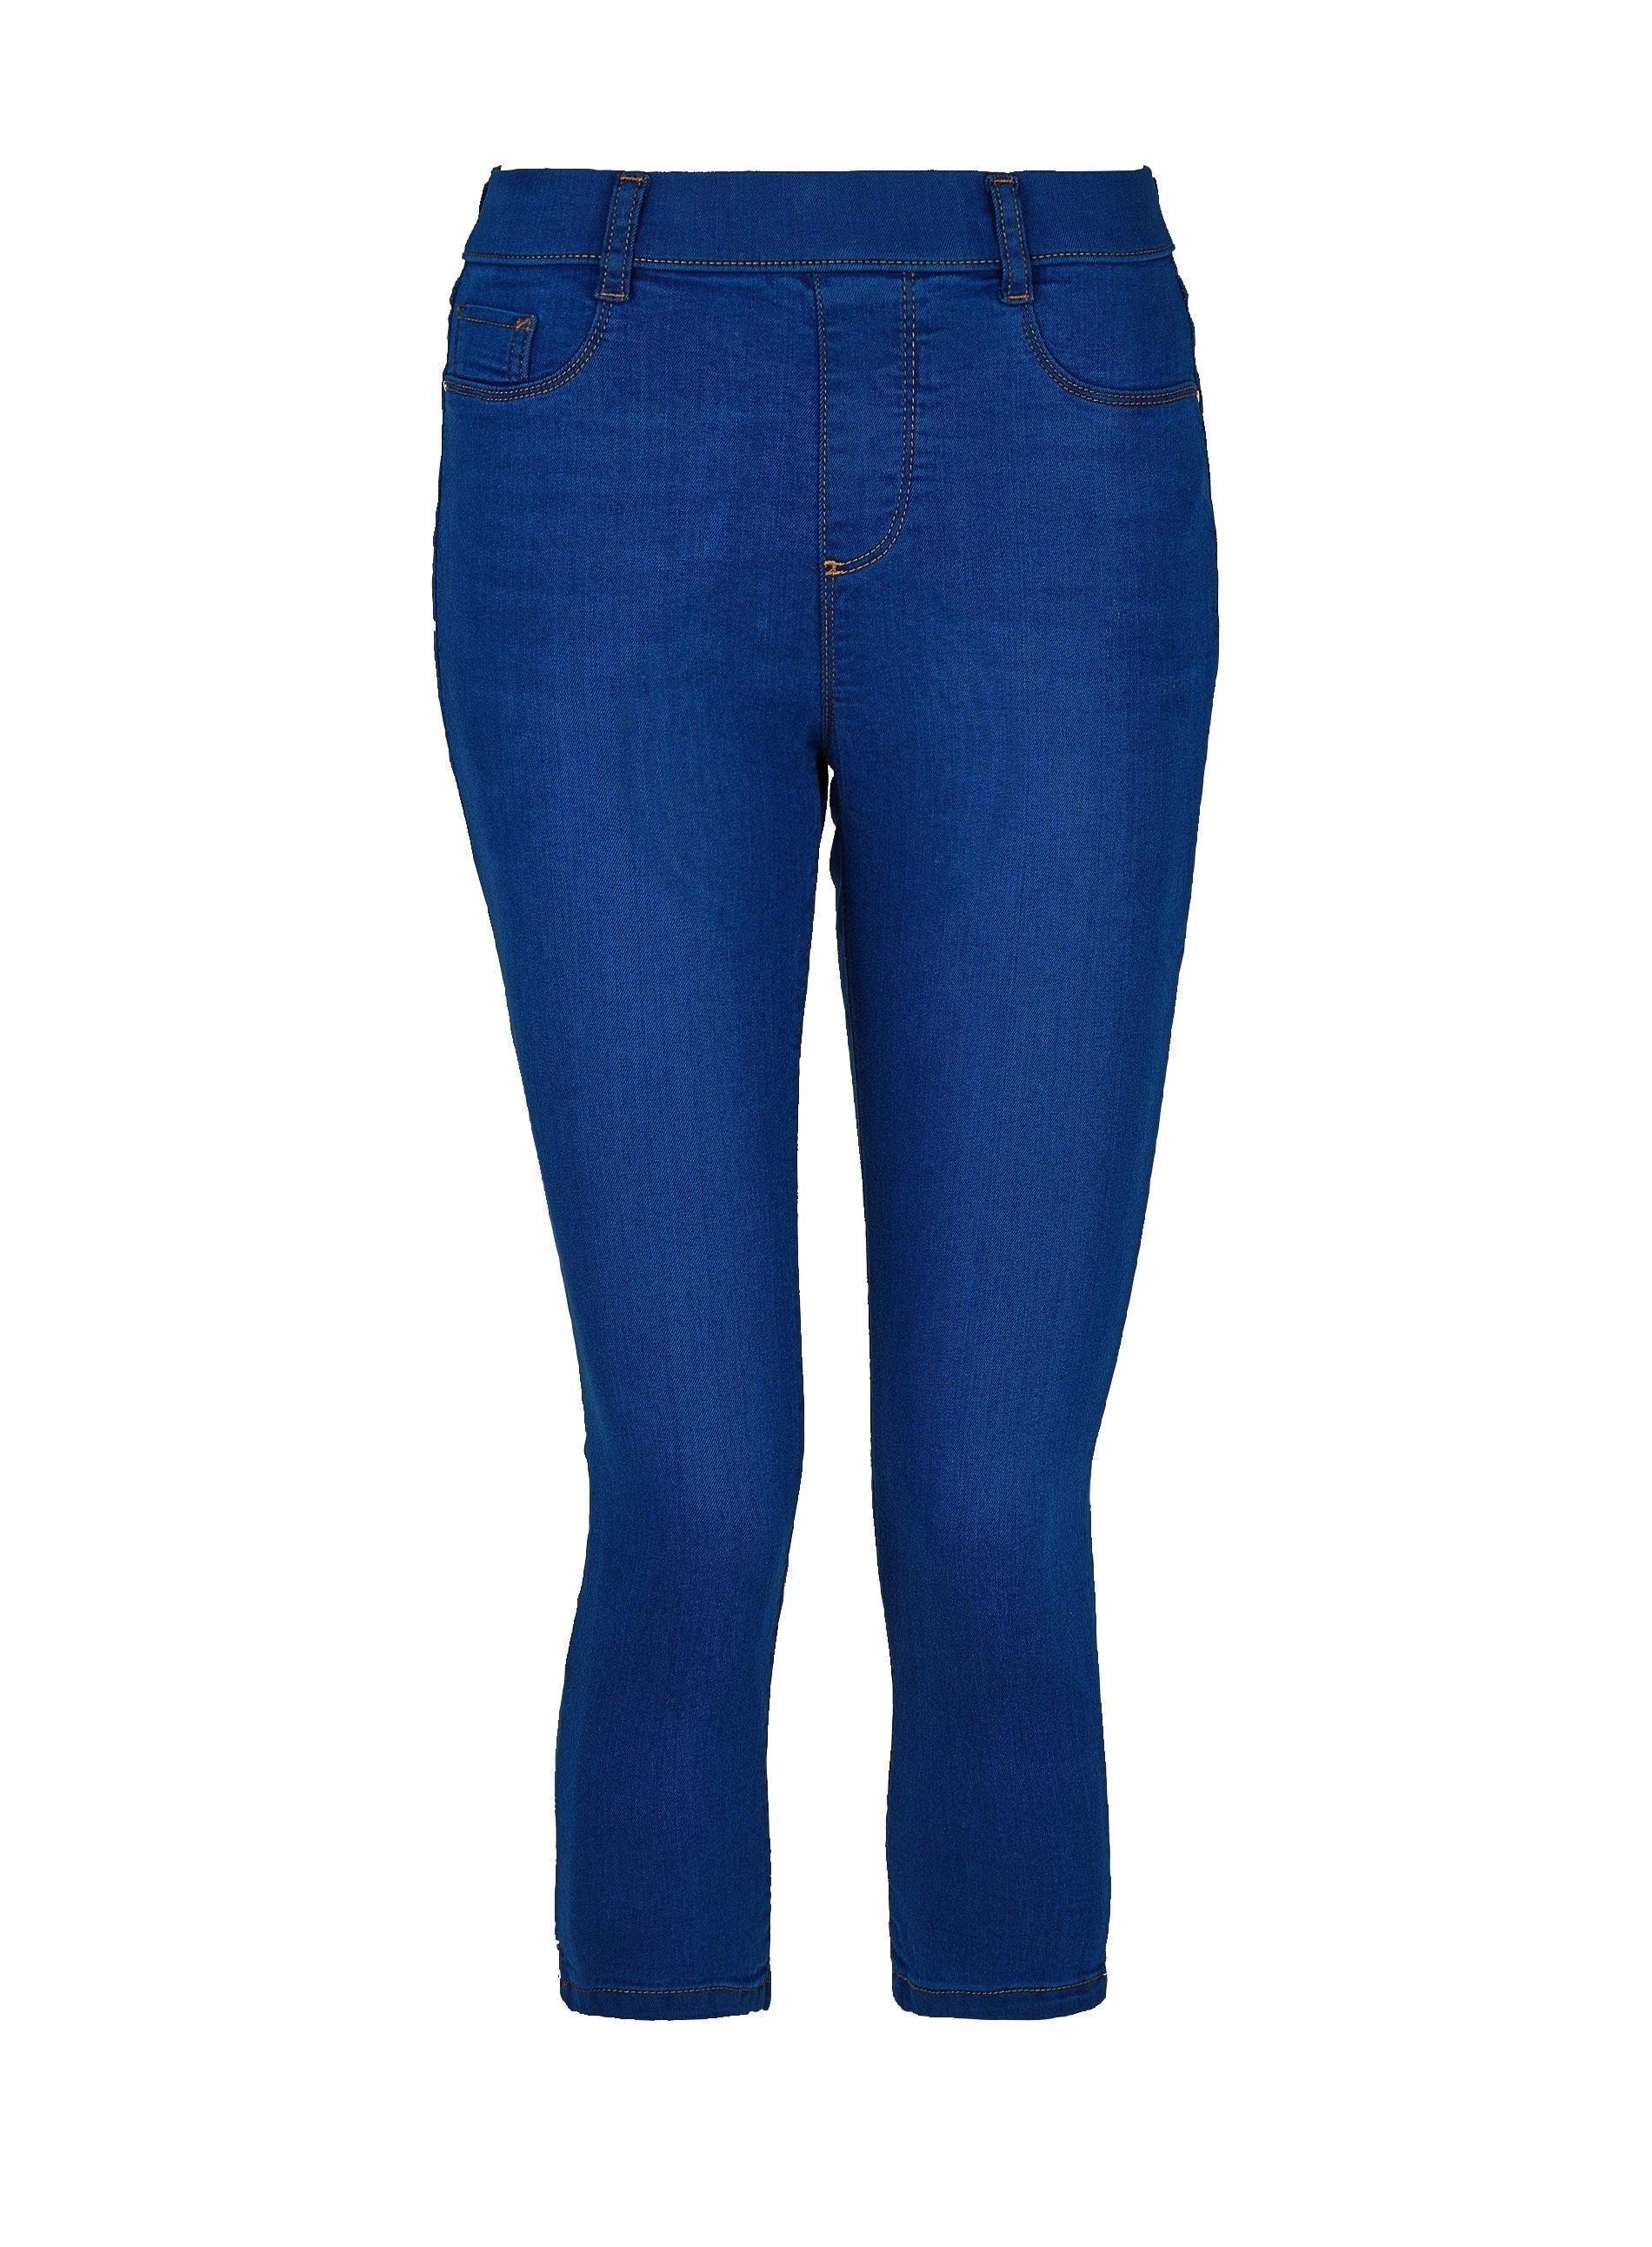 6a64df32dc1e Lyst - Dorothy Perkins Bright Blue Eden Super Soft Cropped Jeggings ...